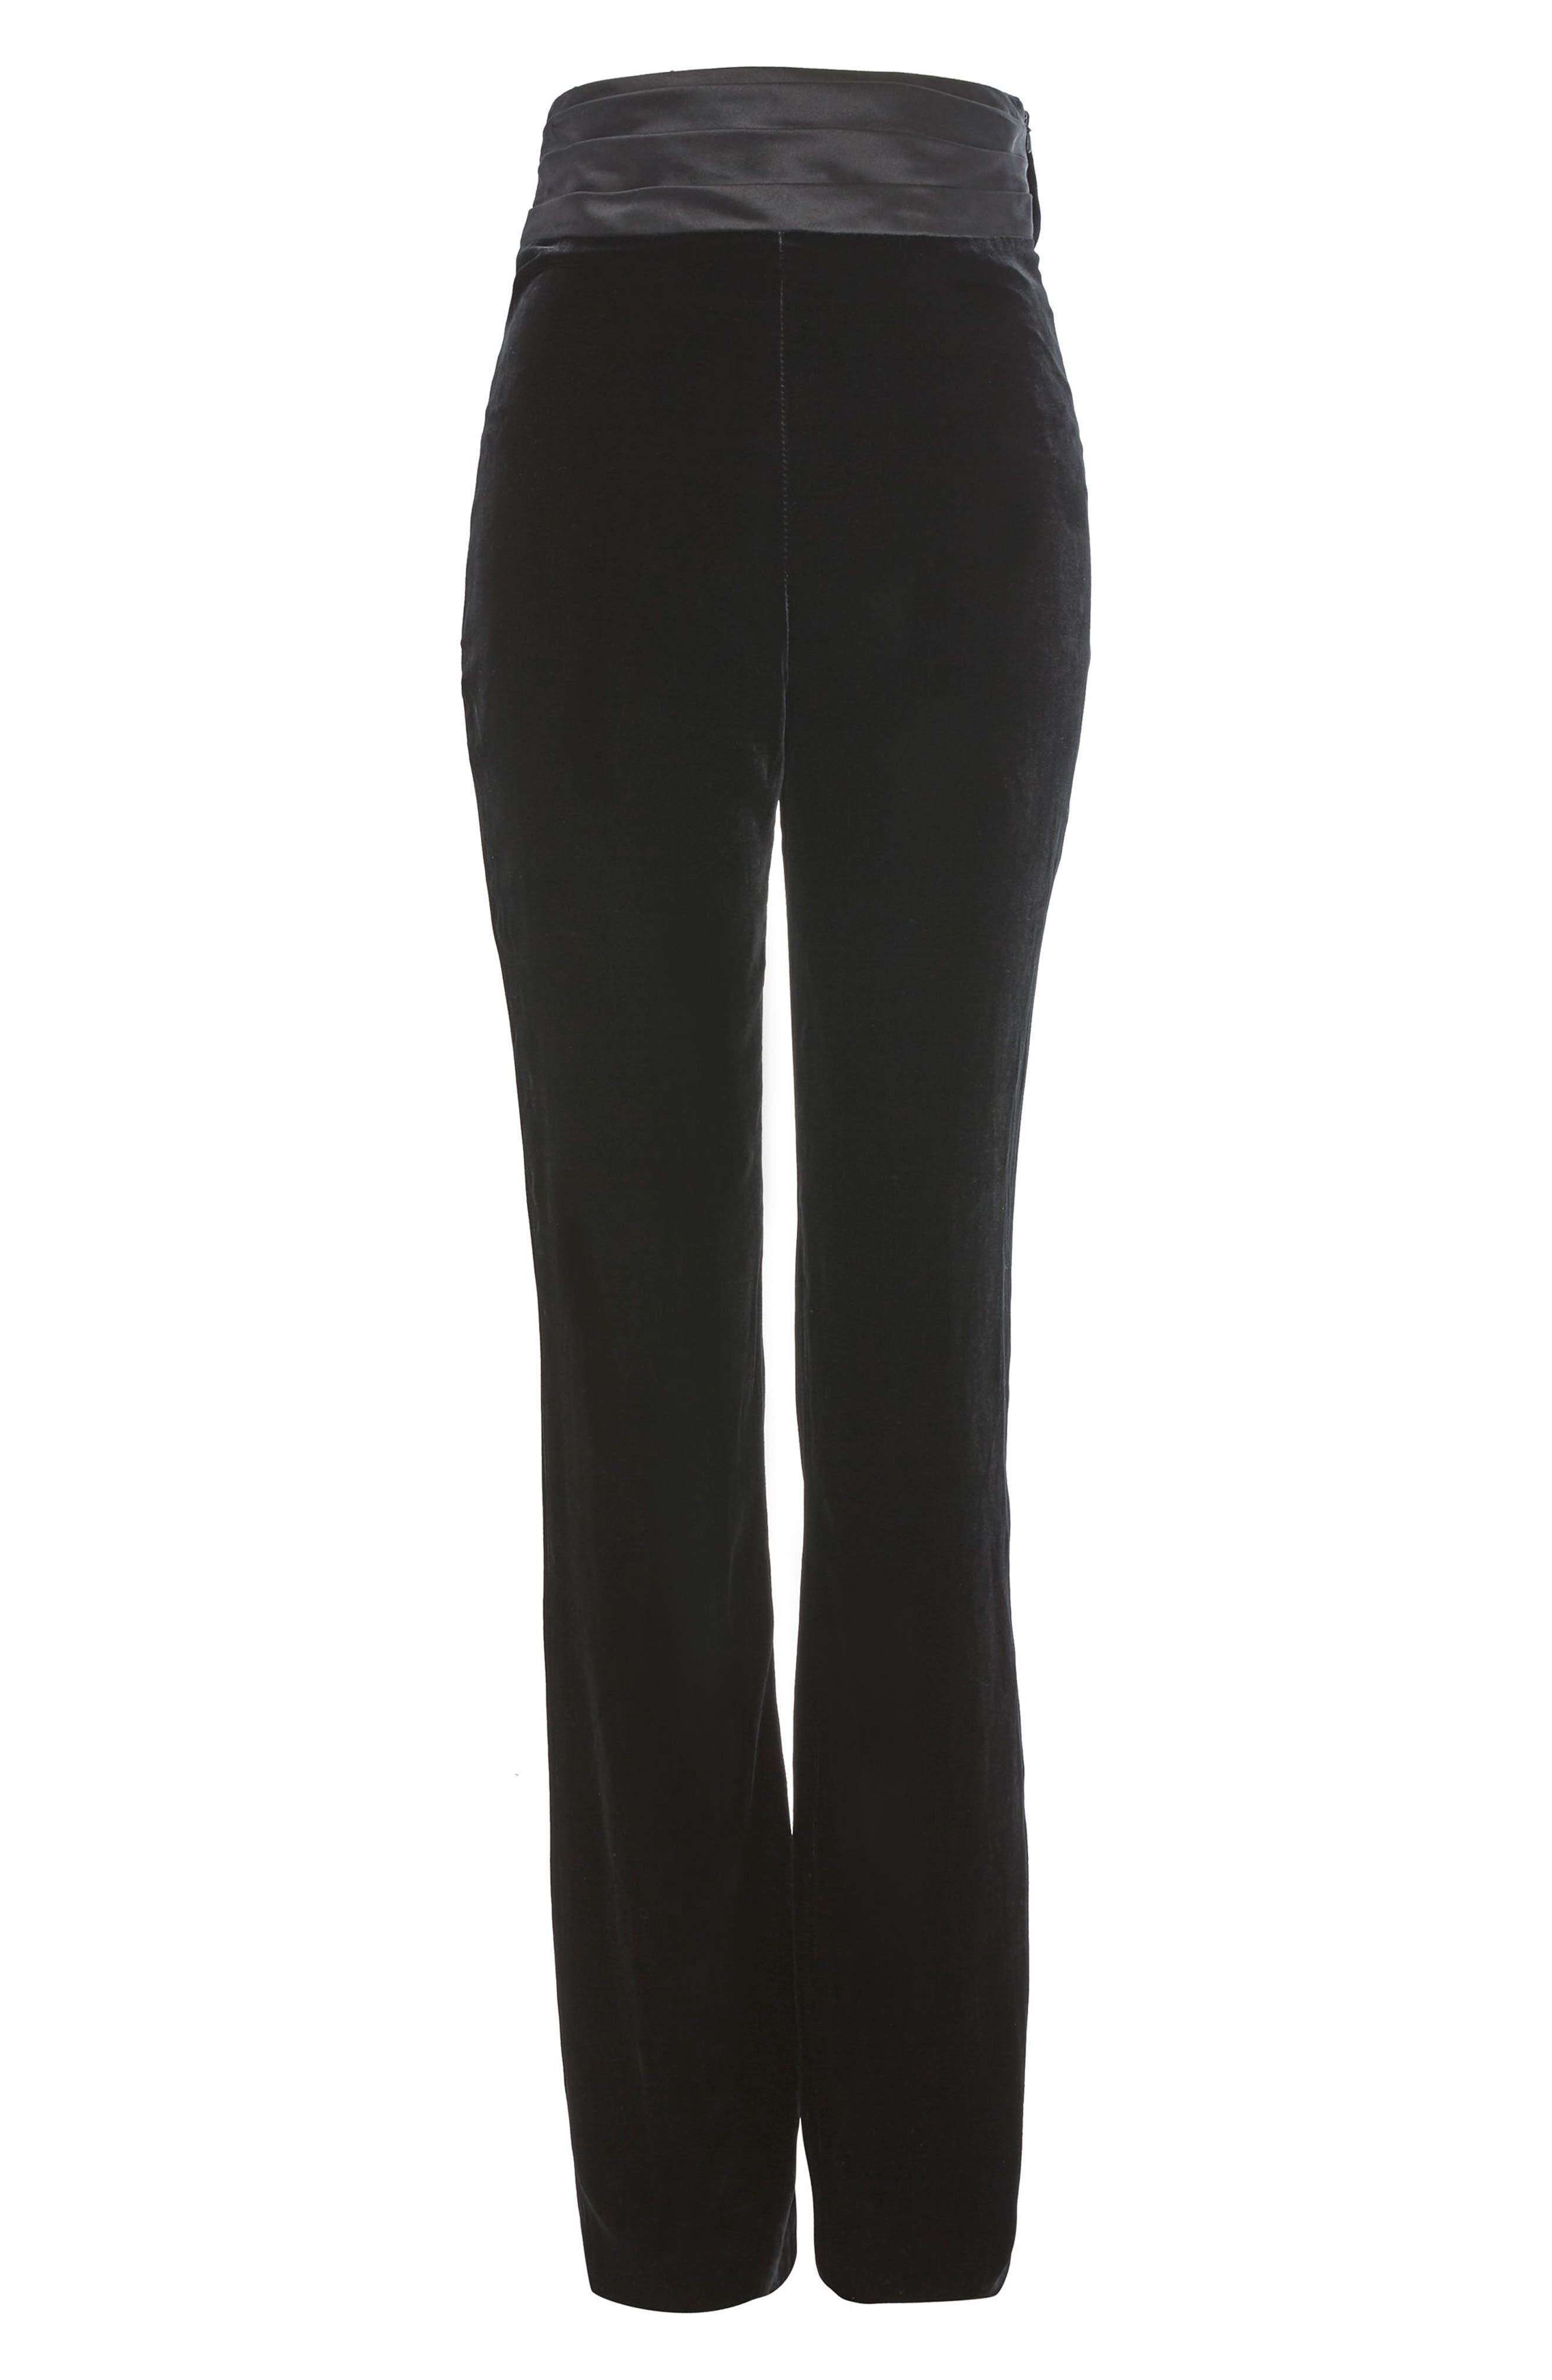 Cummerbund Trousers,                         Main,                         color, 001